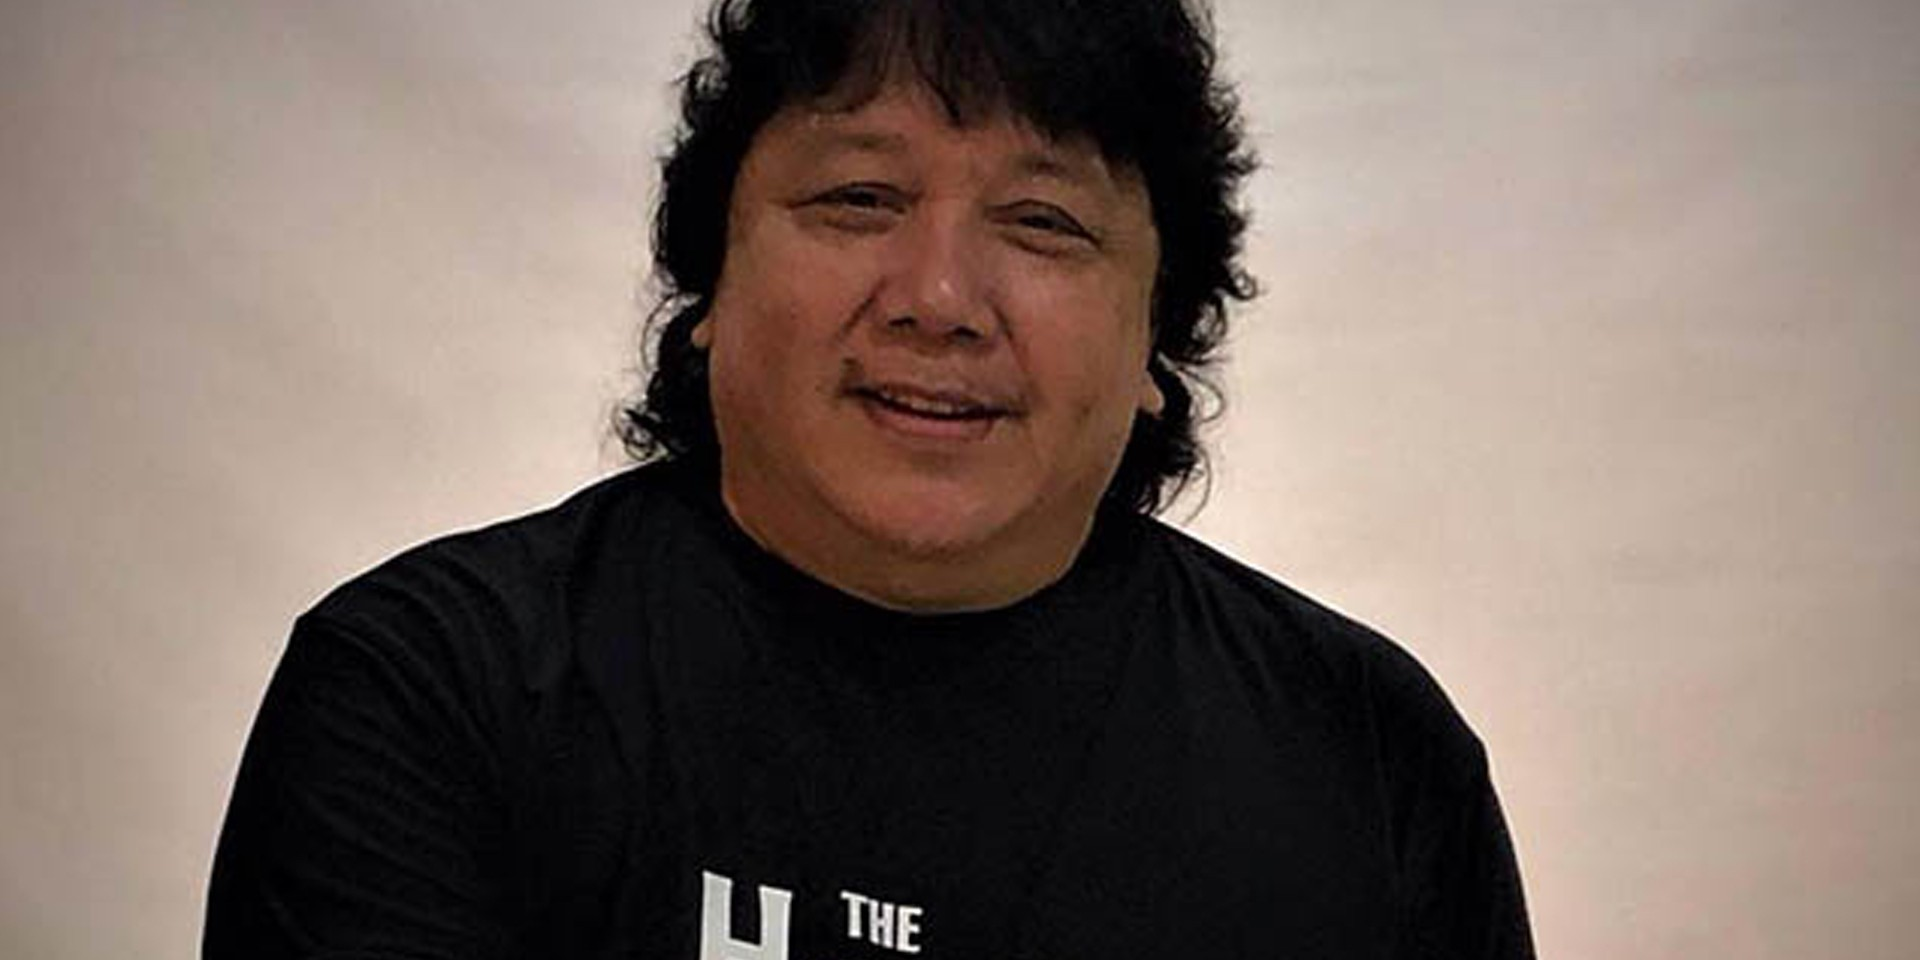 Musicians pay tribute to Hotdog band's Rene Garcia